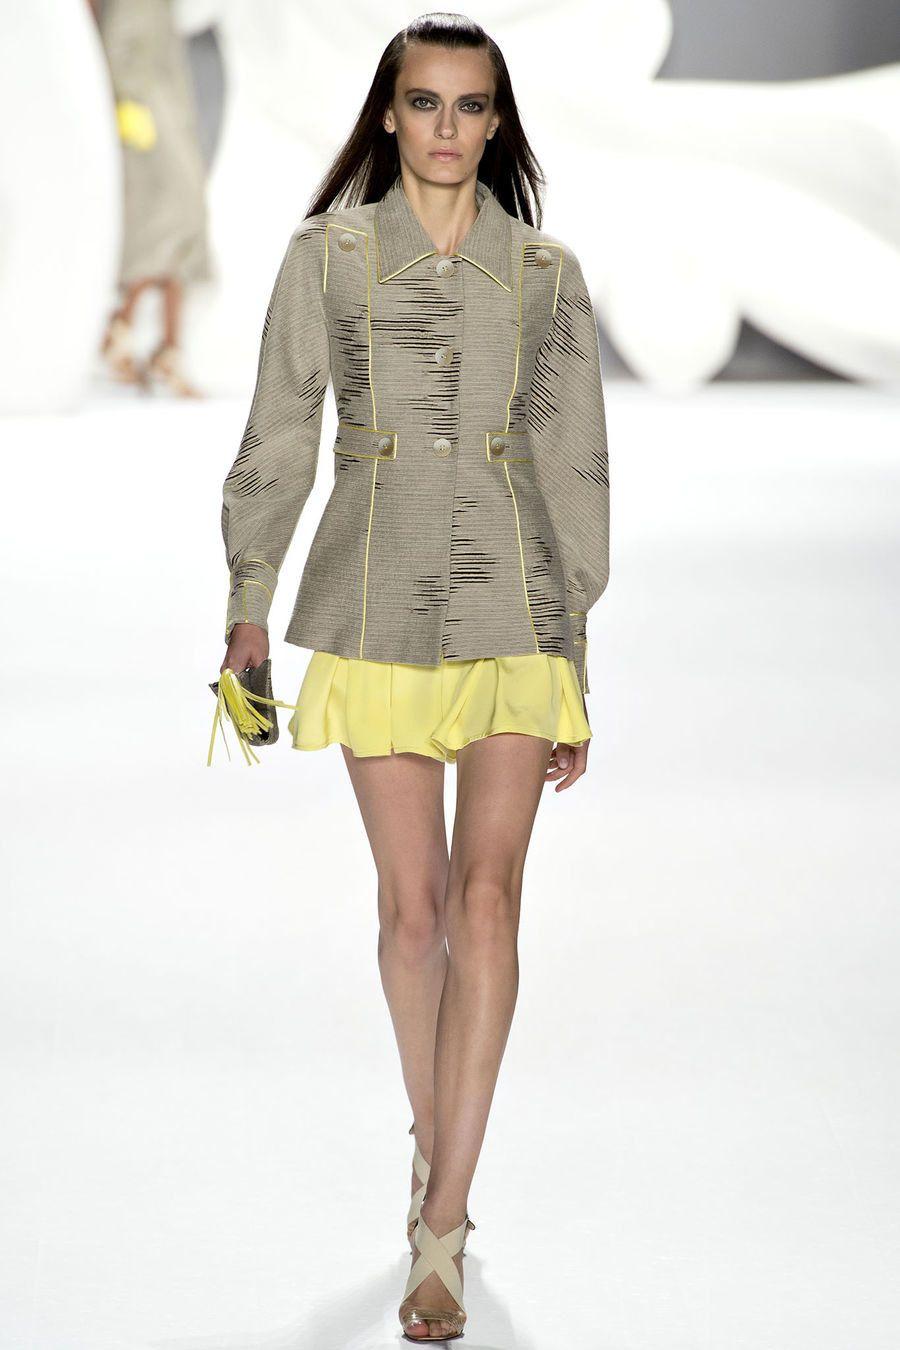 Carolina Herrera Spring 2013 Ready-to-Wear Fashion Show - Erjona Ala